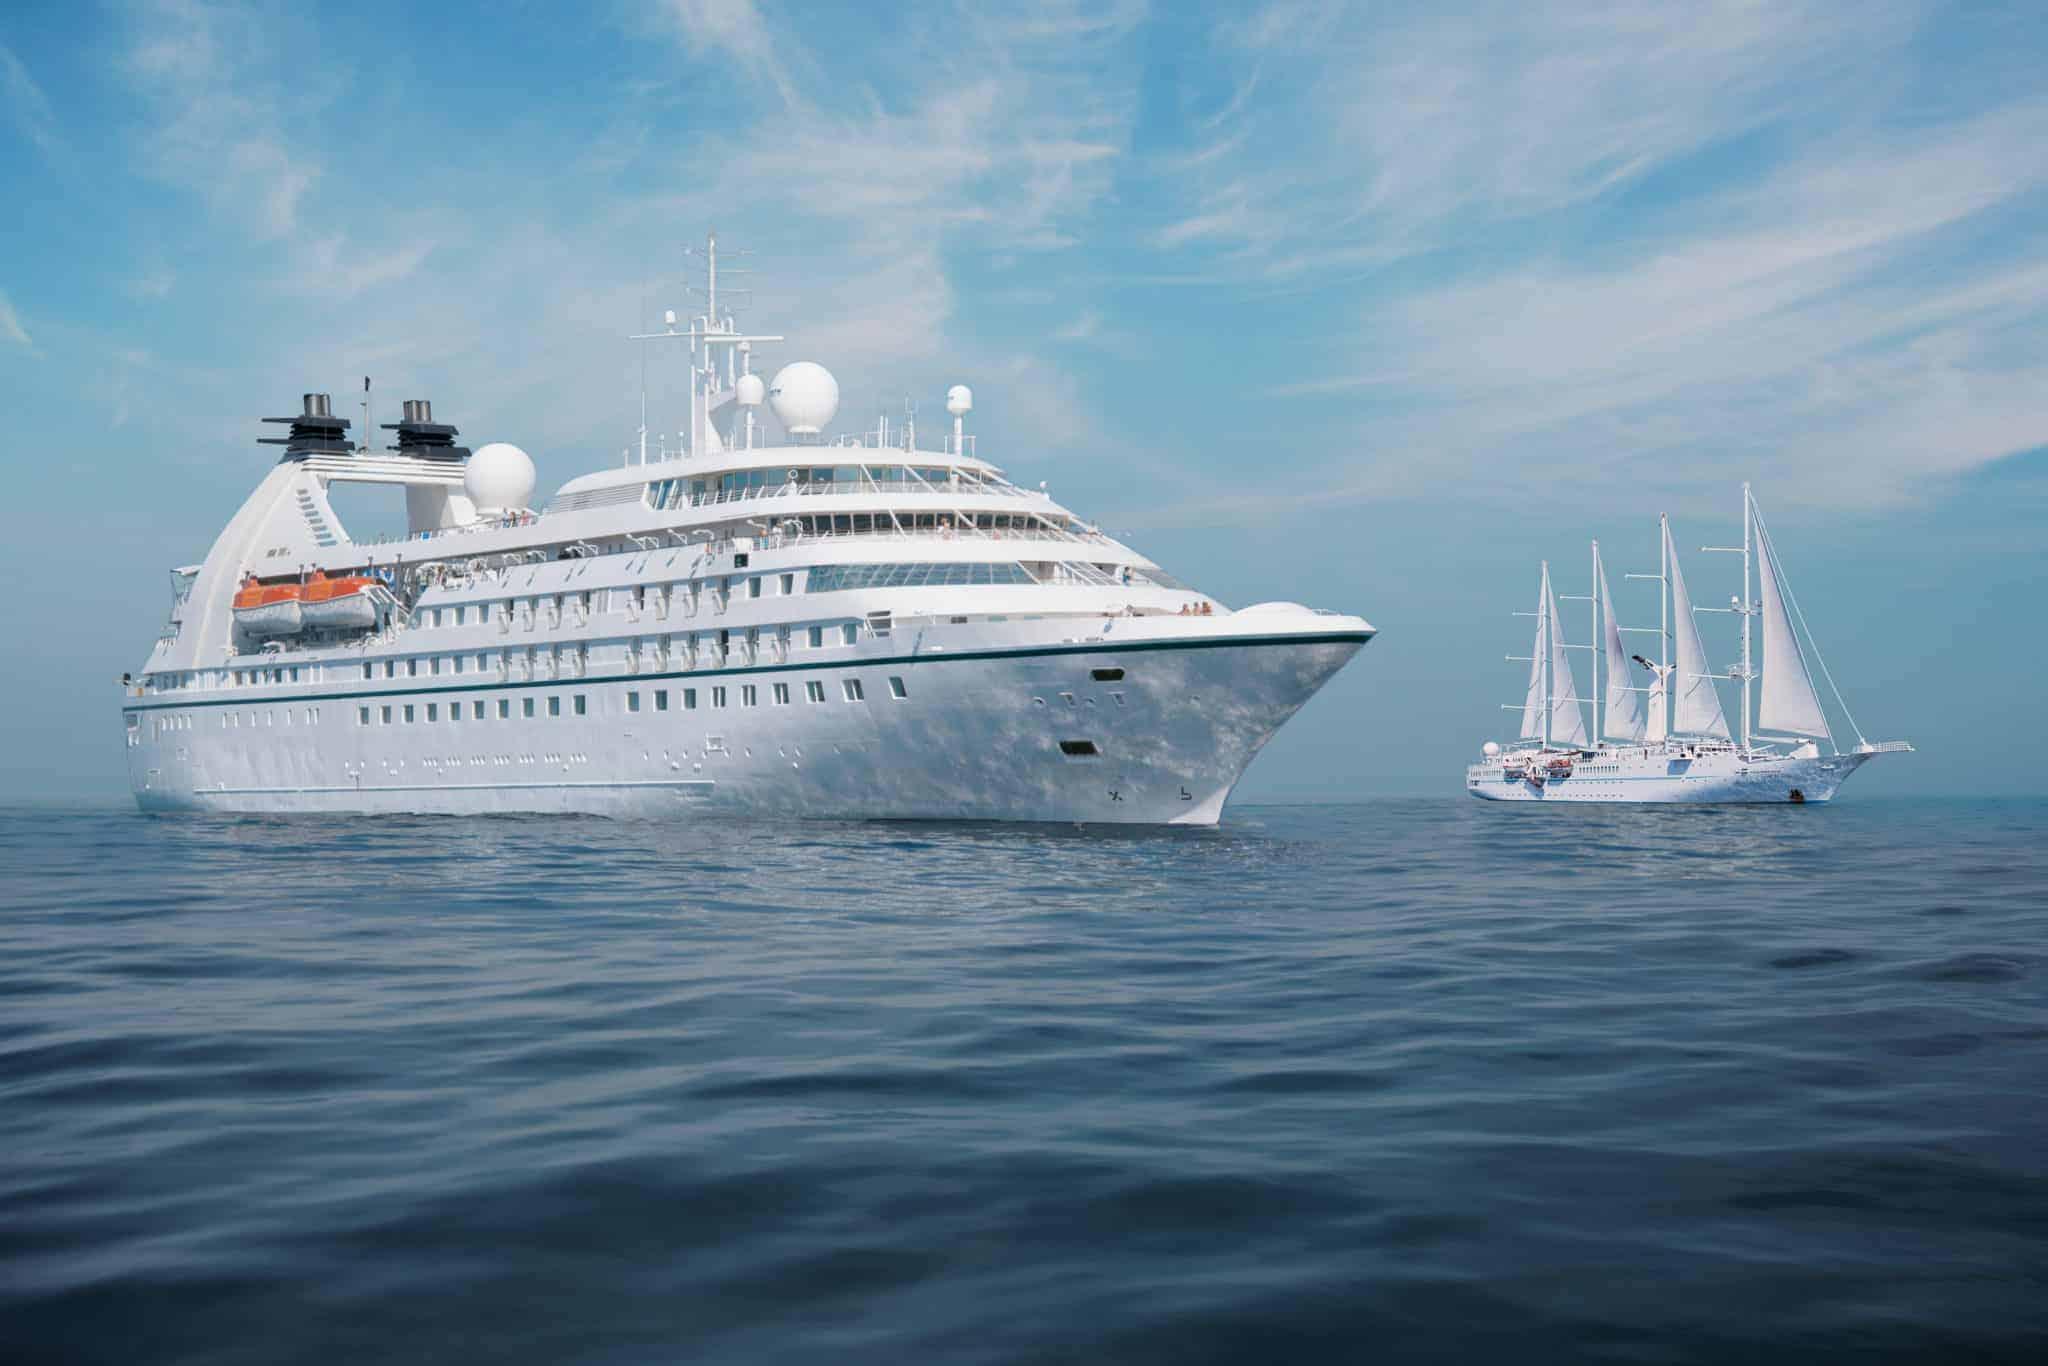 windstar cruises yachts multiple ships